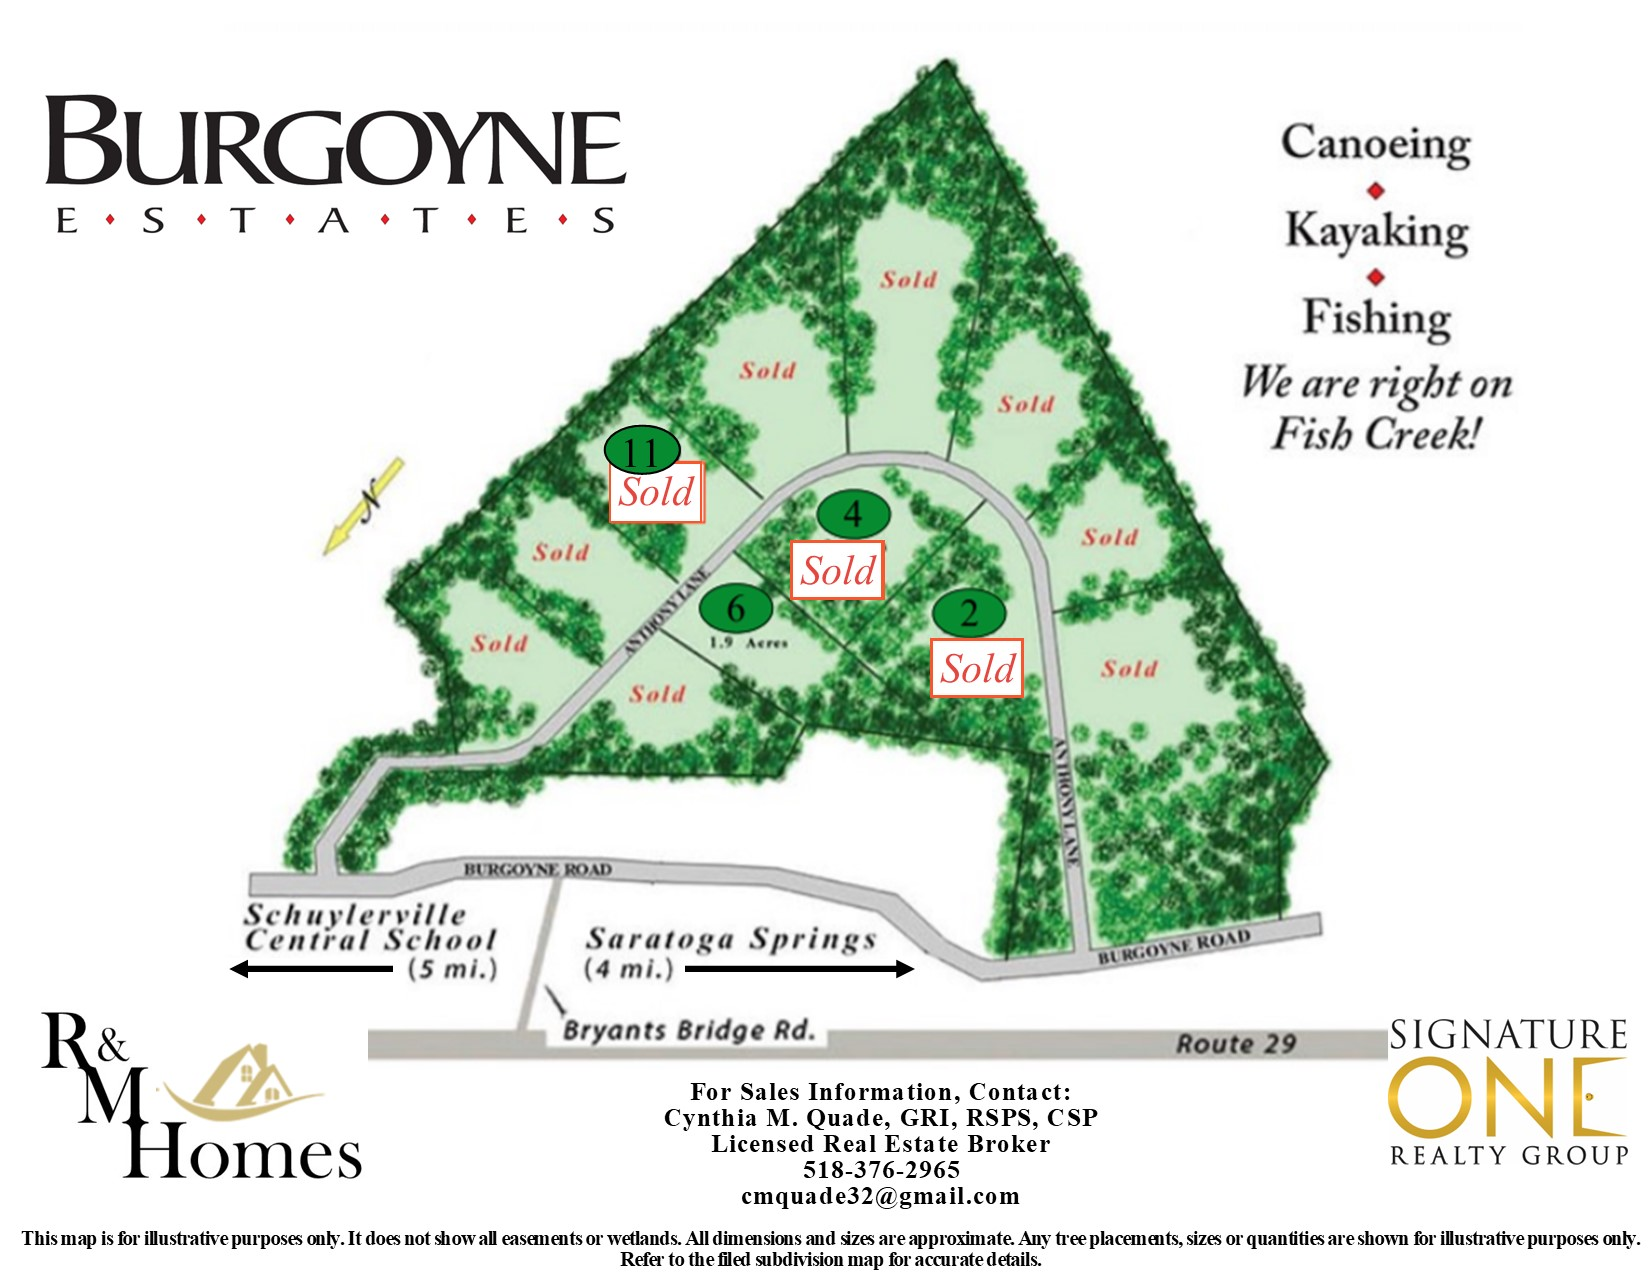 Burgoyne Estates Site Map